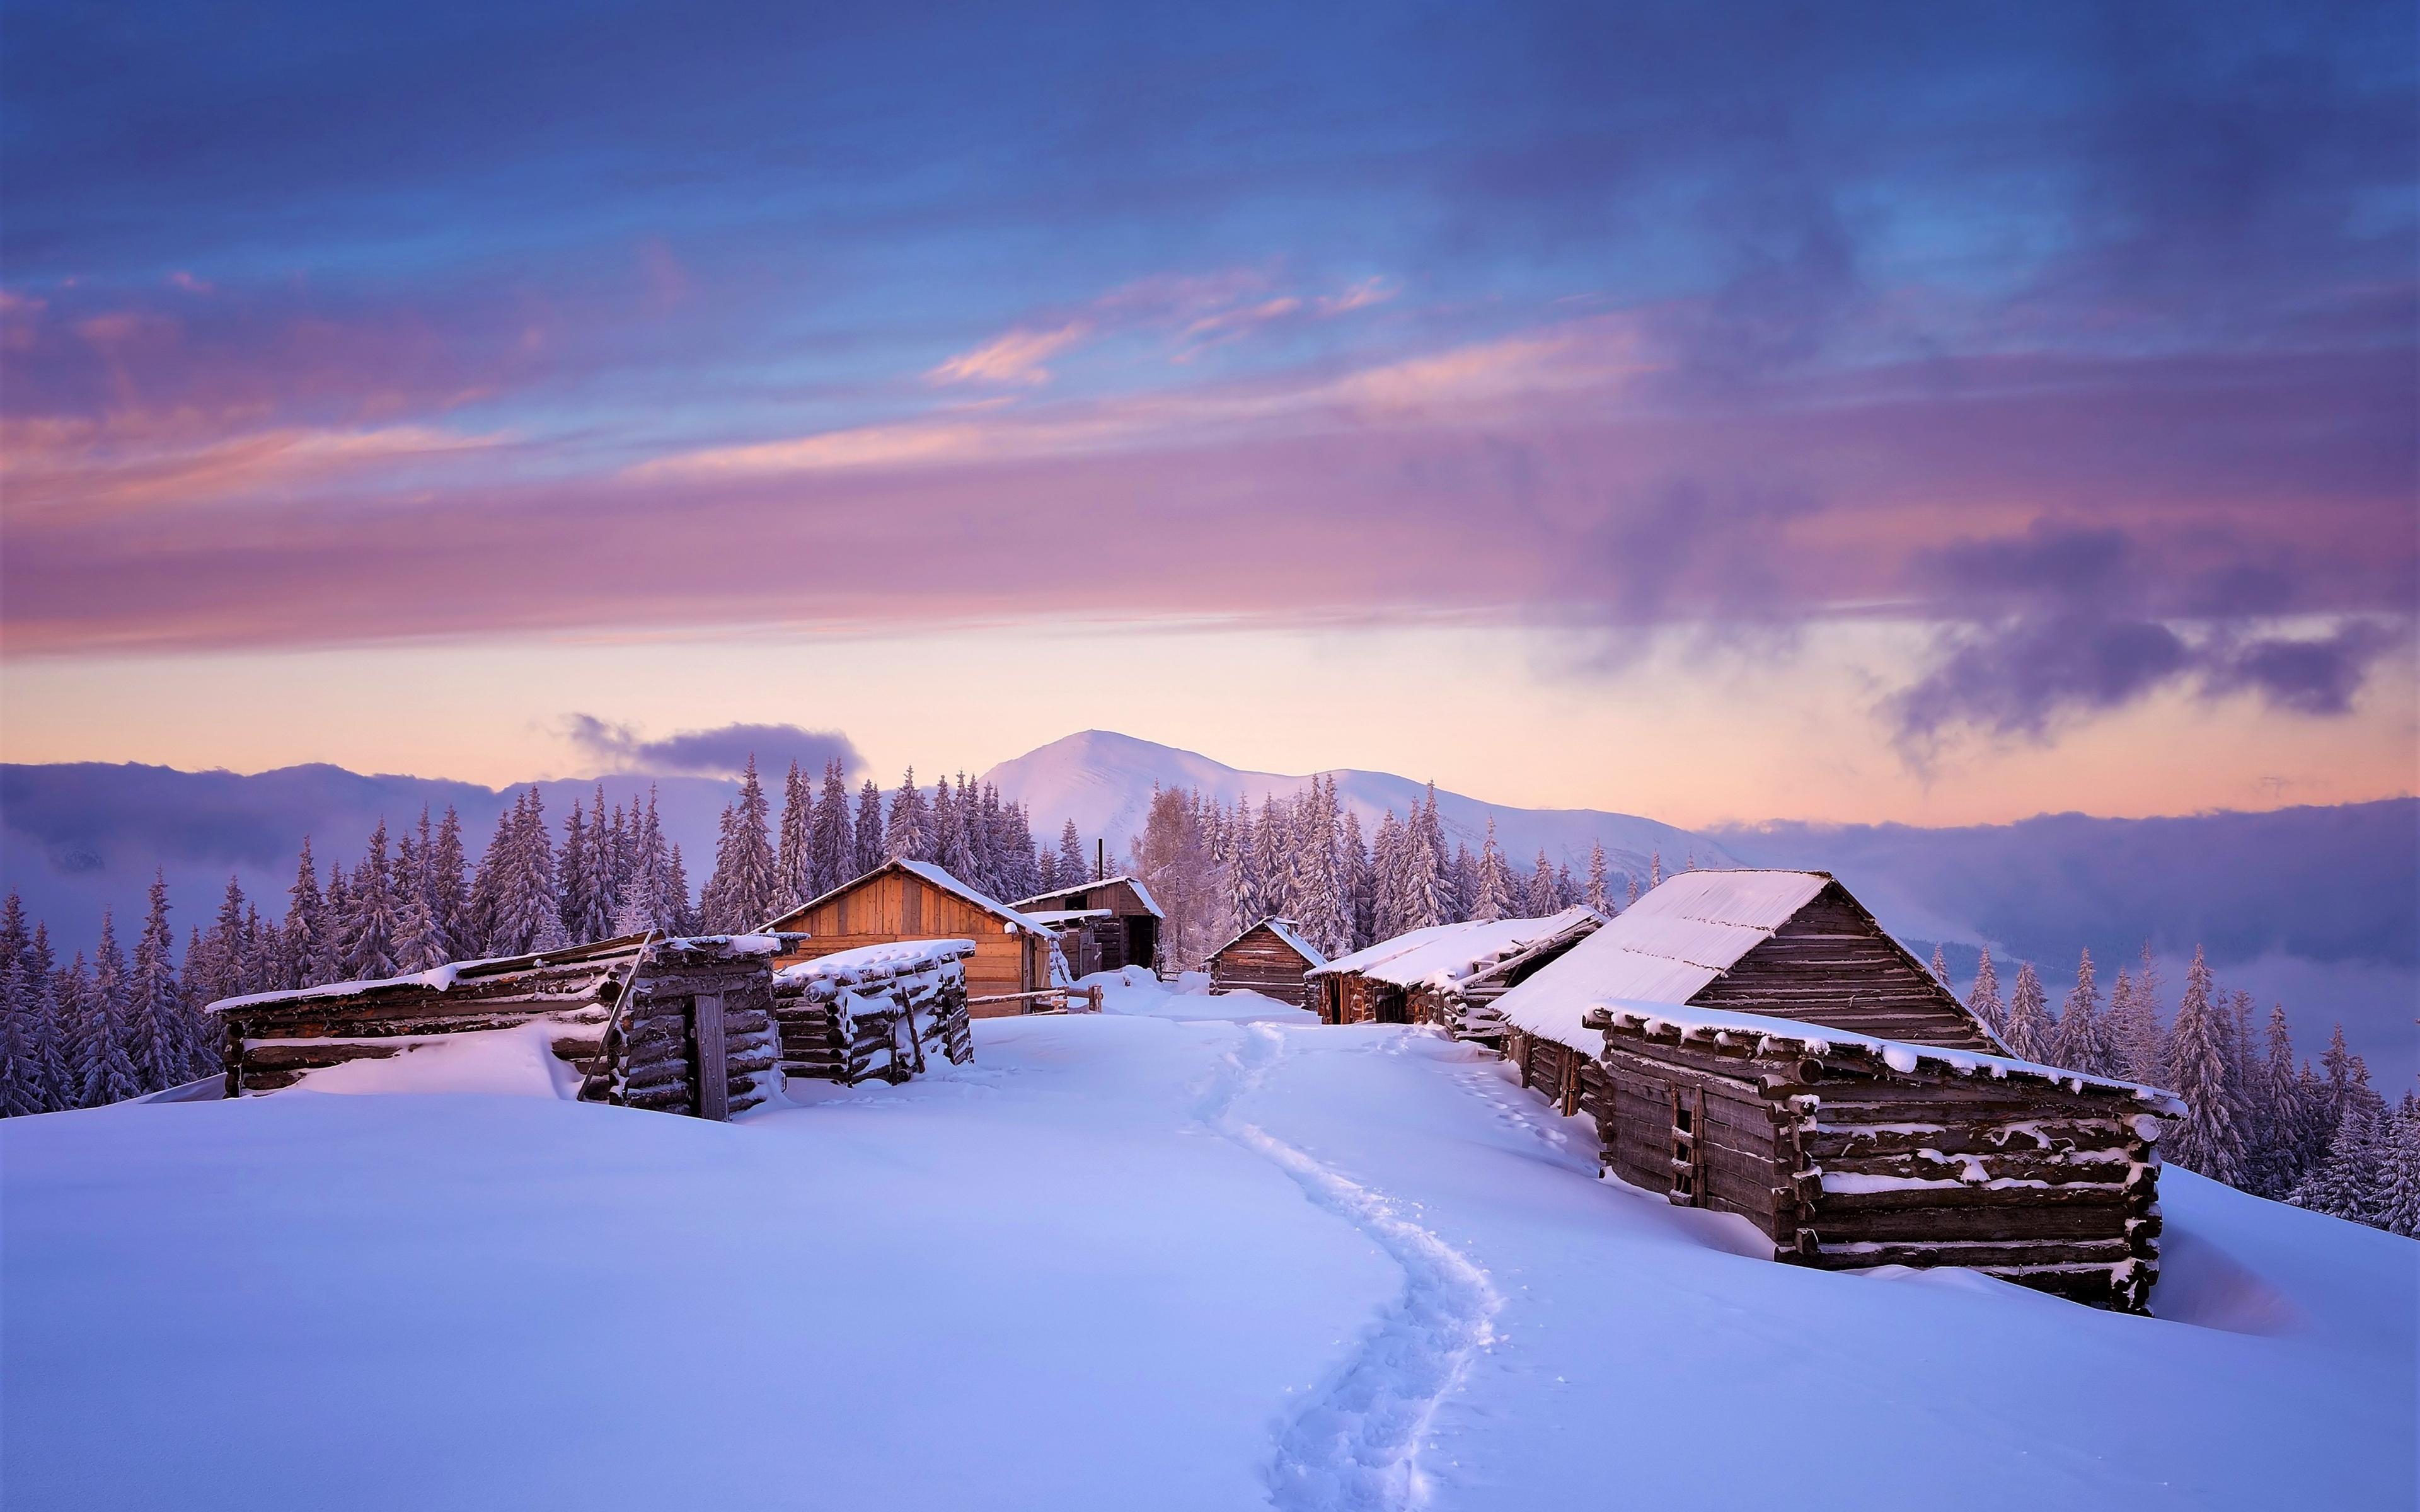 Download 3840x2400 wallpaper houses, winter, landscape ...